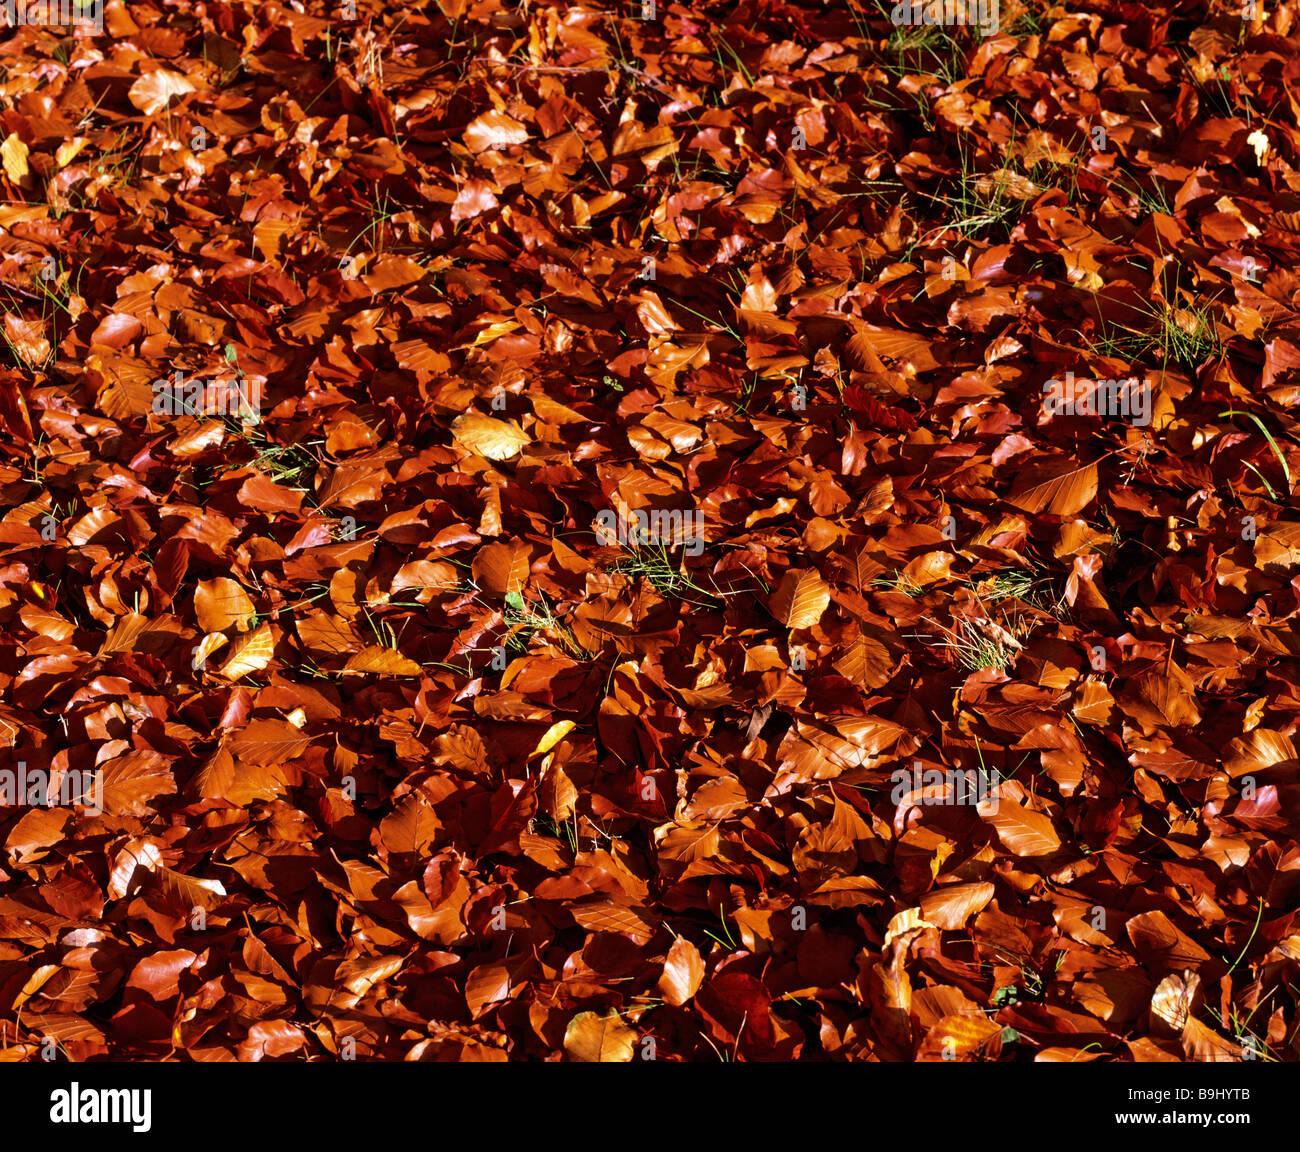 Autumnal foliage, forest, leef litter, beech tree - Stock Image